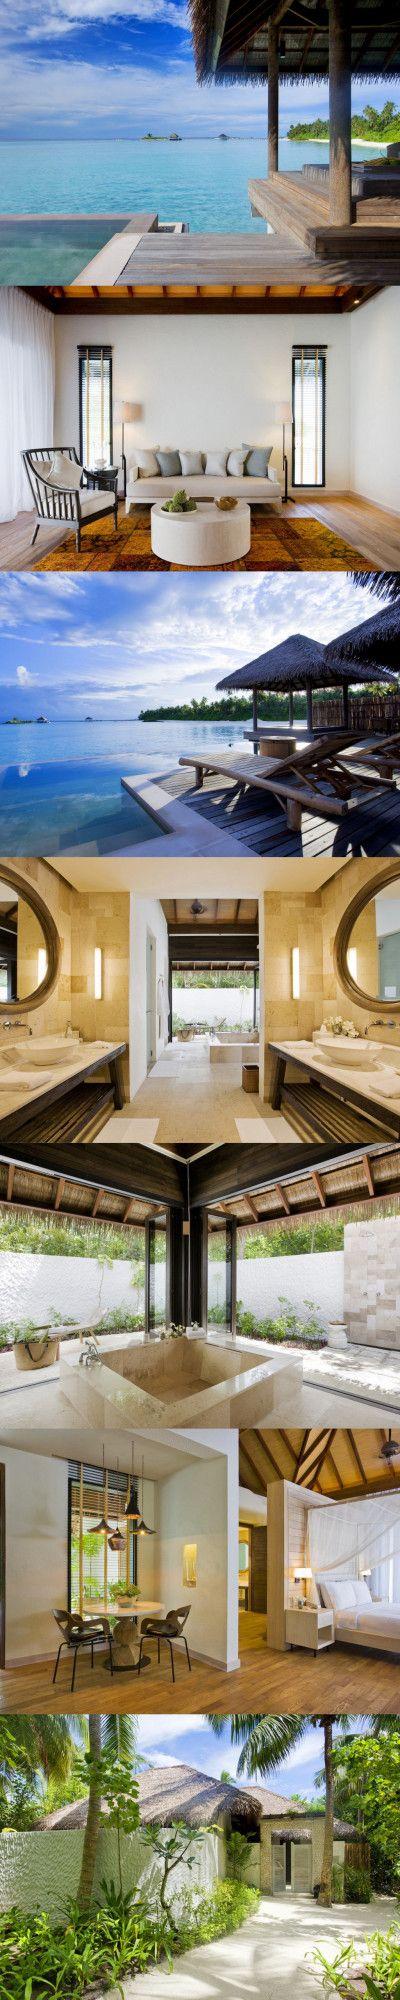 Maalifushi by COMO is the newest luxury resort in #Maldives.